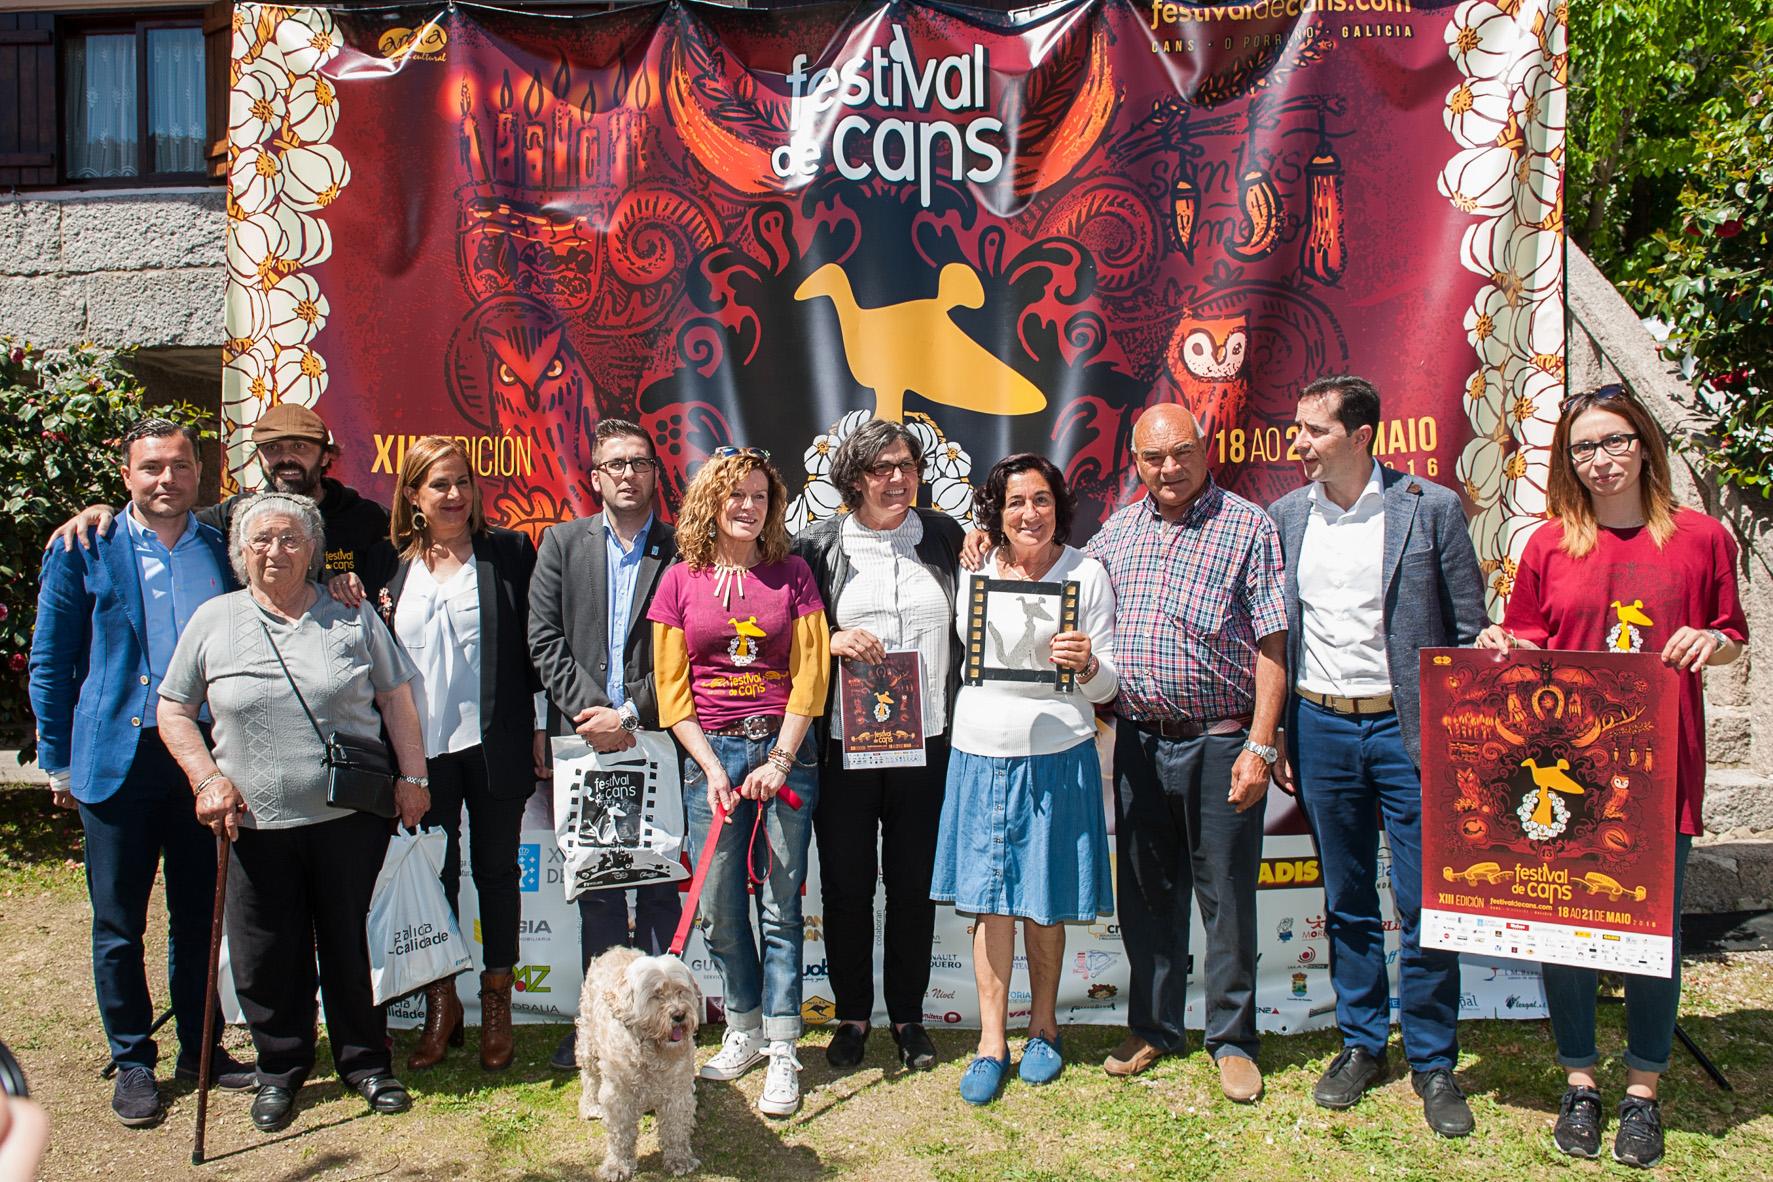 Presentacion Festival de Cans 2016